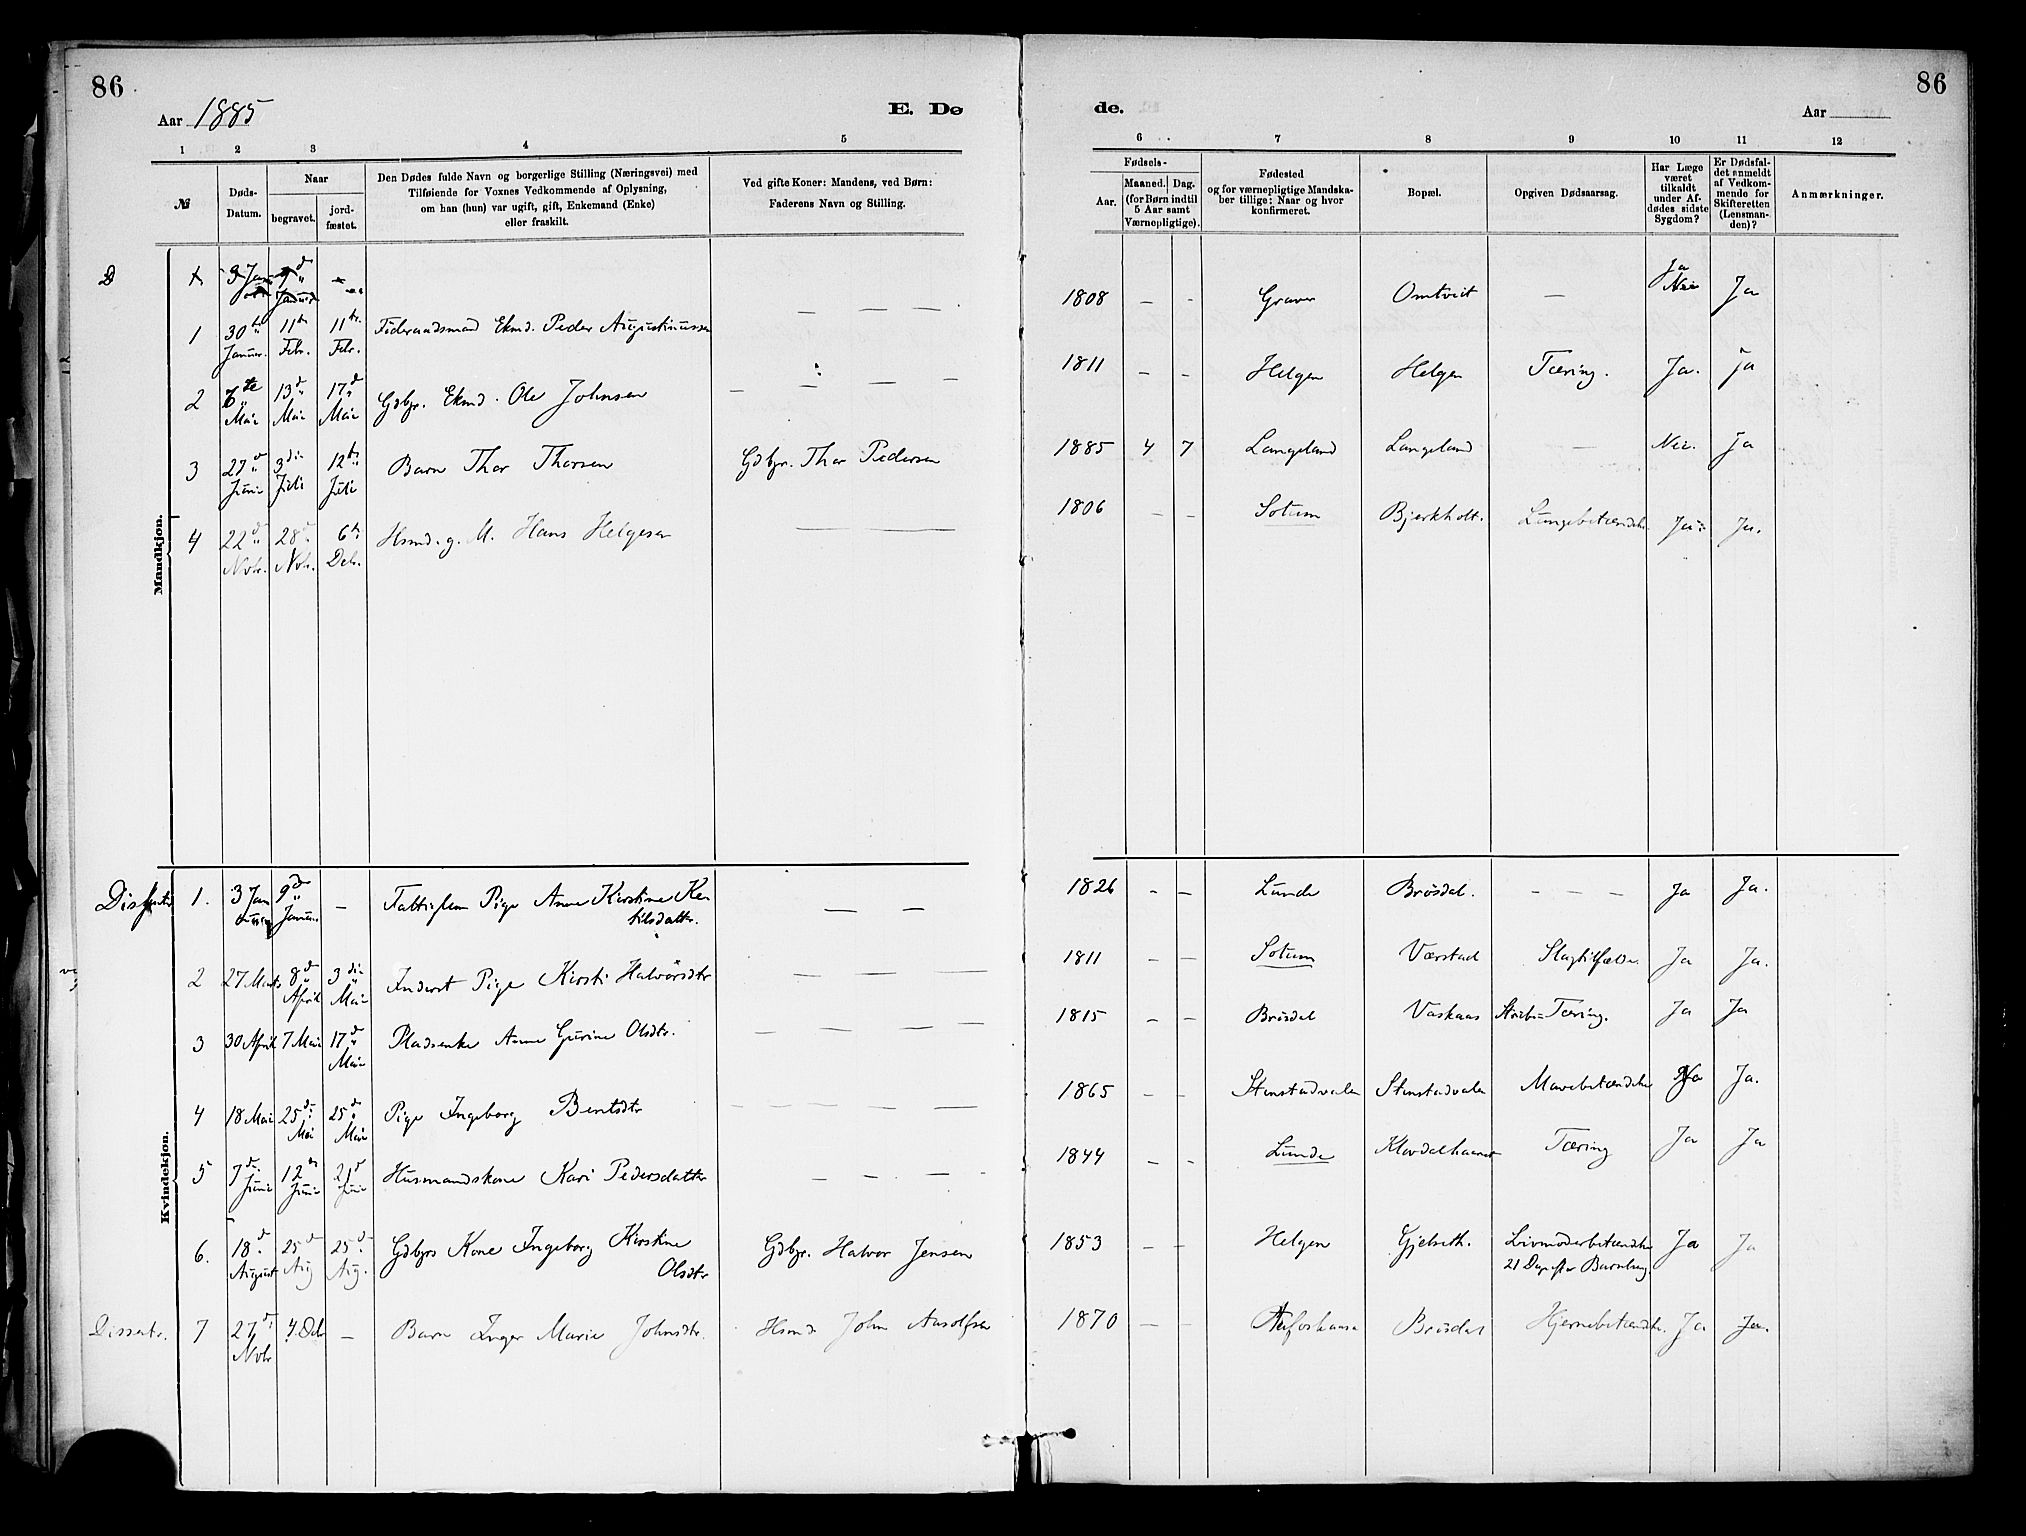 SAKO, Holla kirkebøker, F/Fa/L0009: Ministerialbok nr. 9, 1881-1897, s. 86